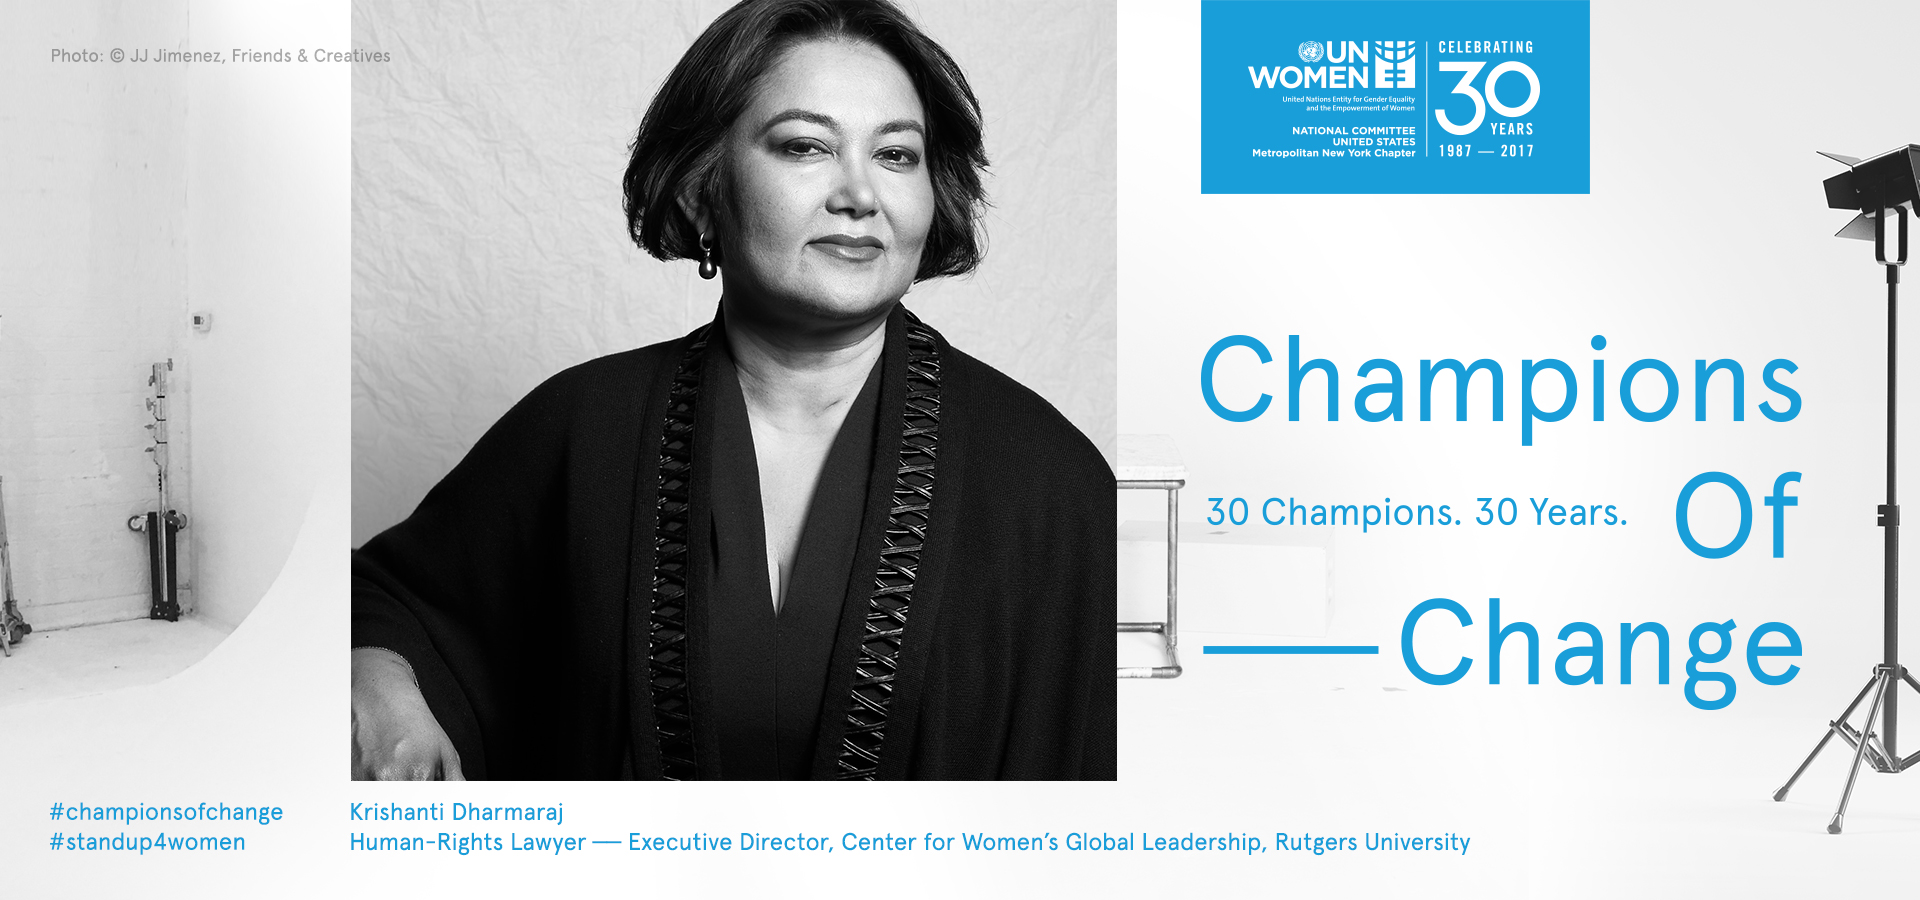 2018_UNWomen_ChampionsOfChange_Website_ProfilePage_KrishantiDharmaraj.jpg